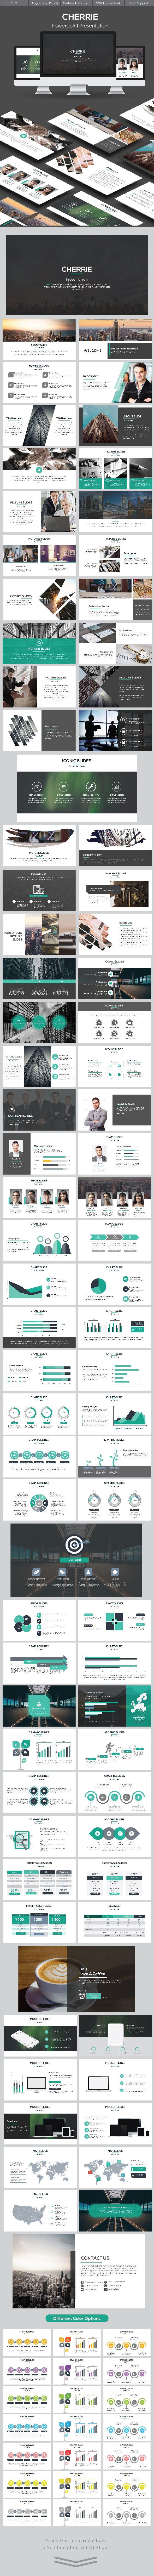 Cherrie Powerpoint (PowerPoint Templates)